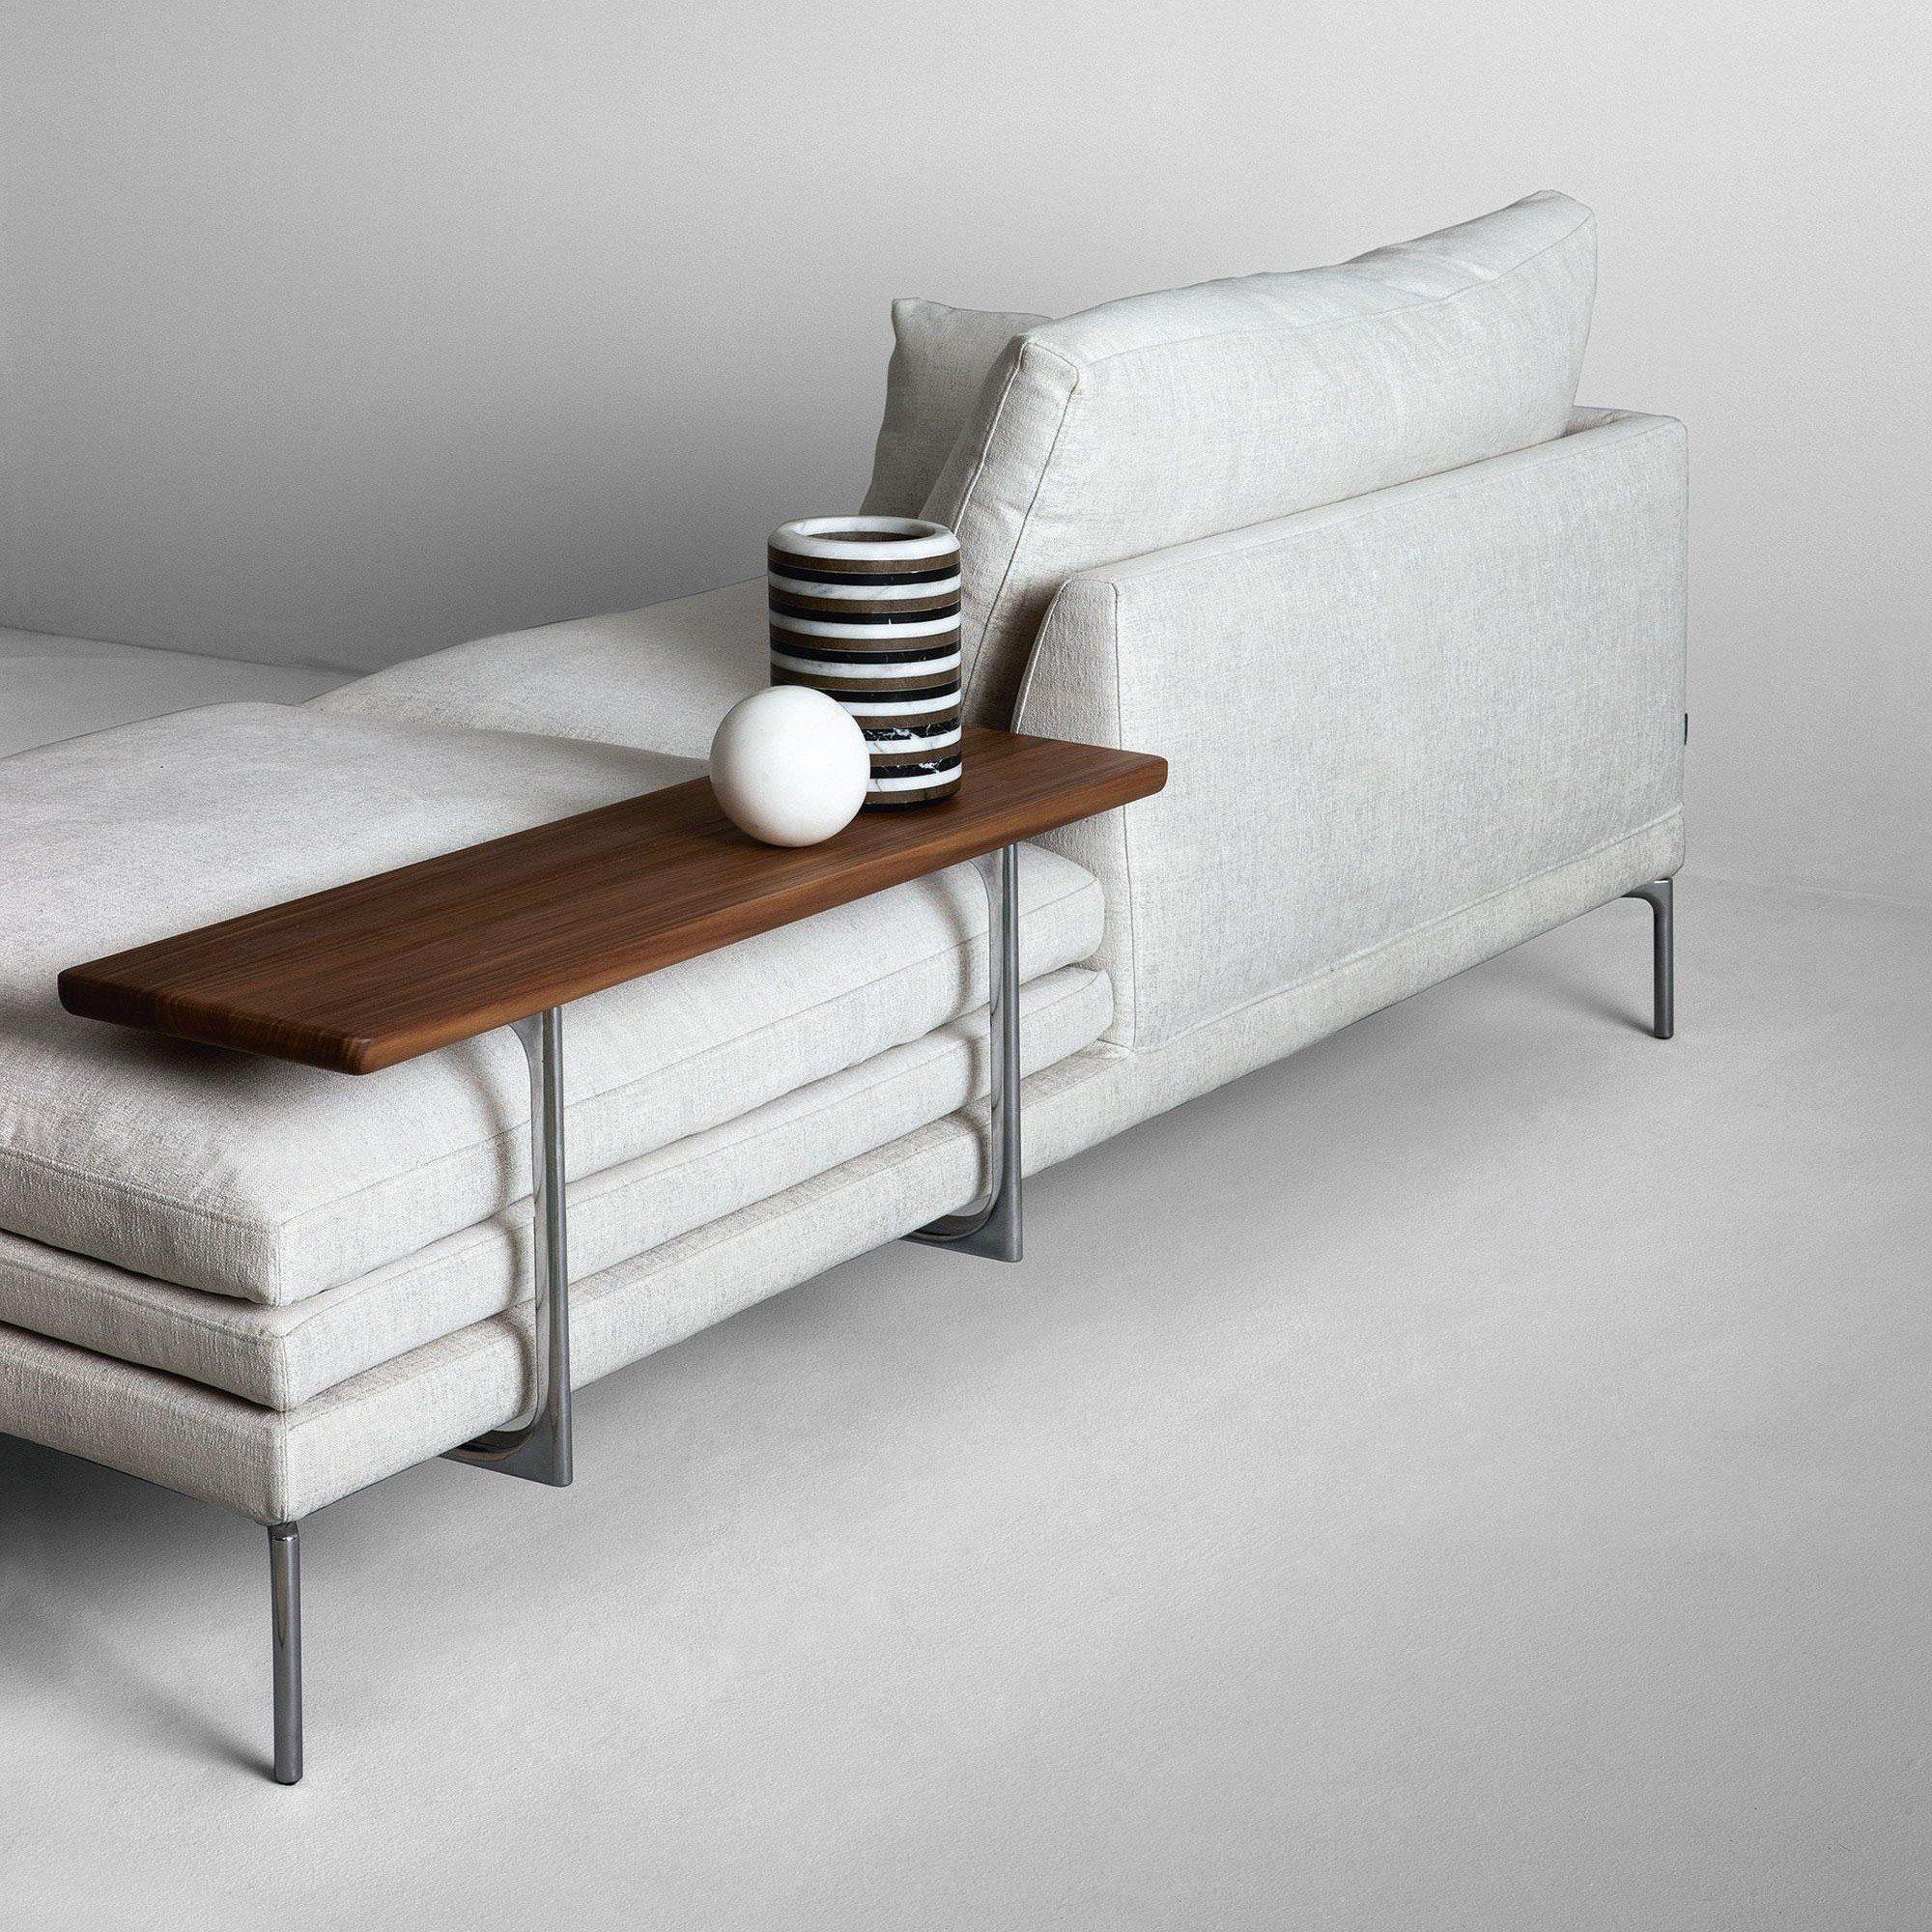 william canap avec chaise longue zanotta. Black Bedroom Furniture Sets. Home Design Ideas